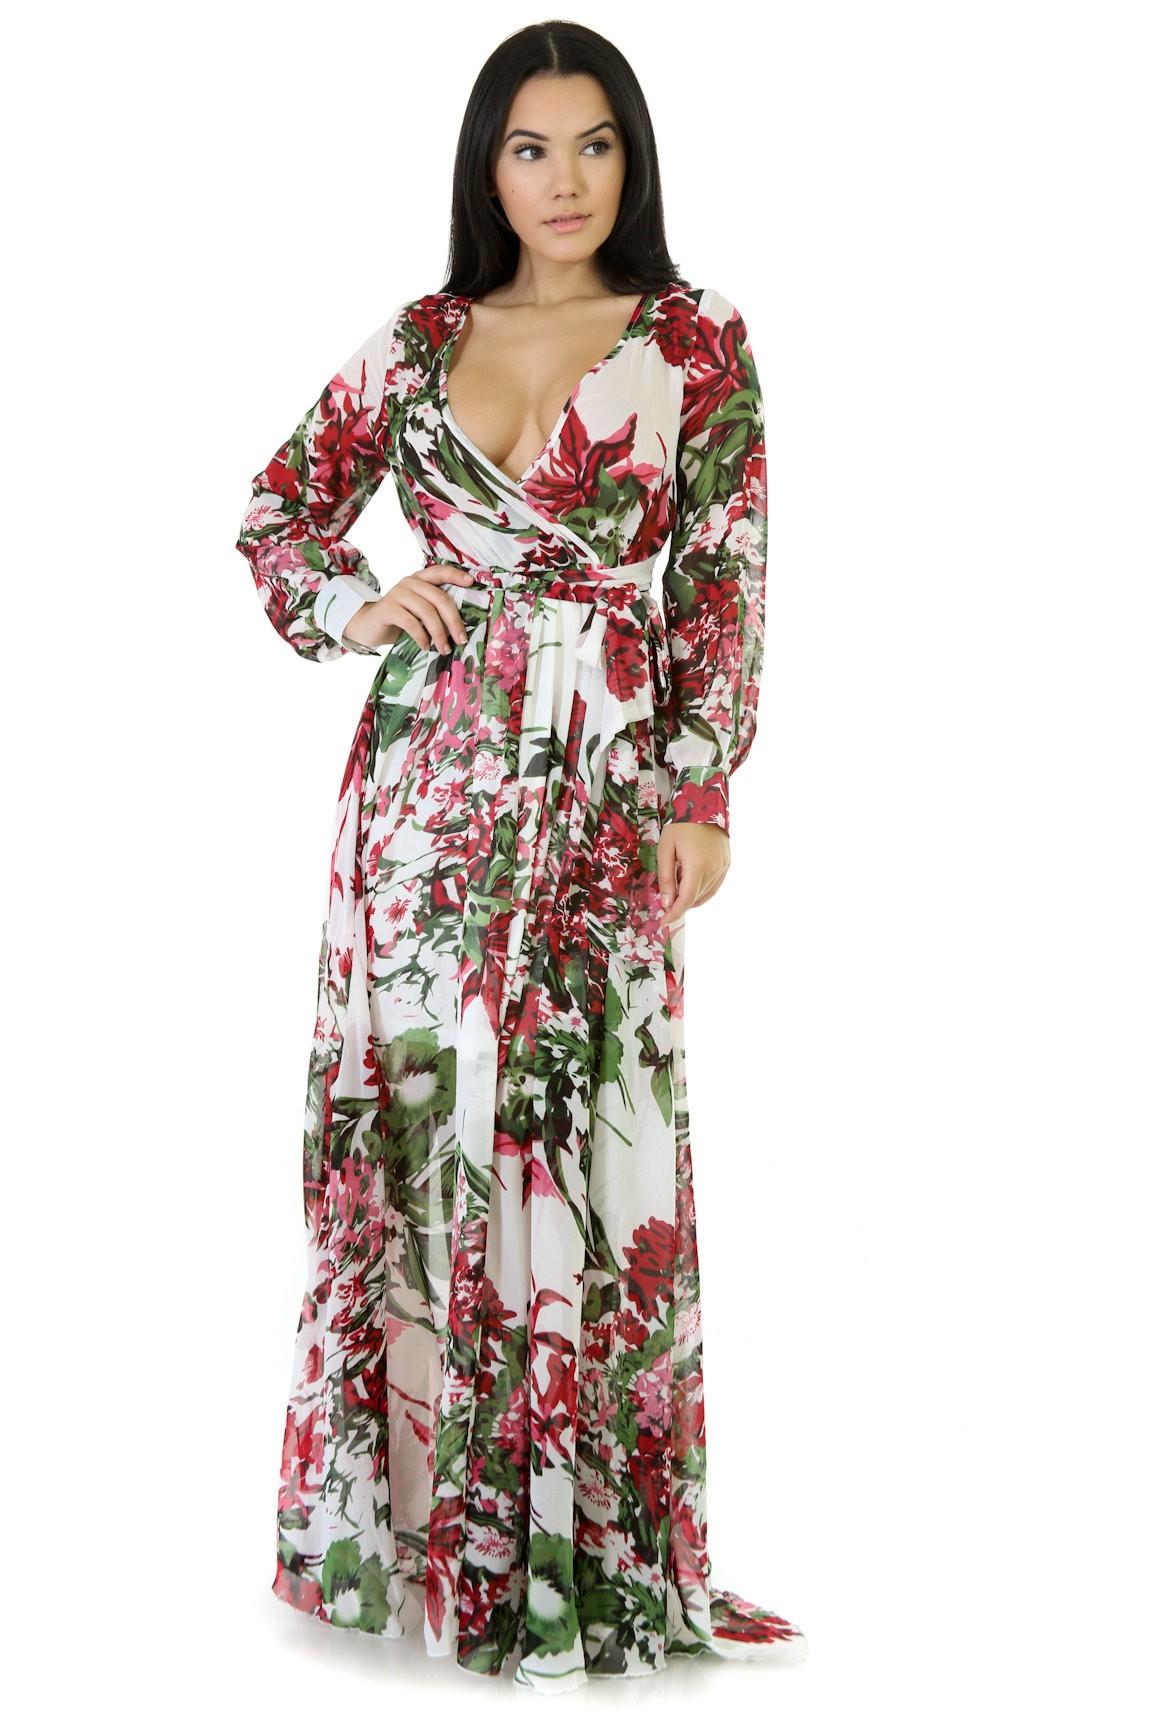 82d7df736c4d Chiffon Floral Print Maxi Dress. SKU# : GT1645211